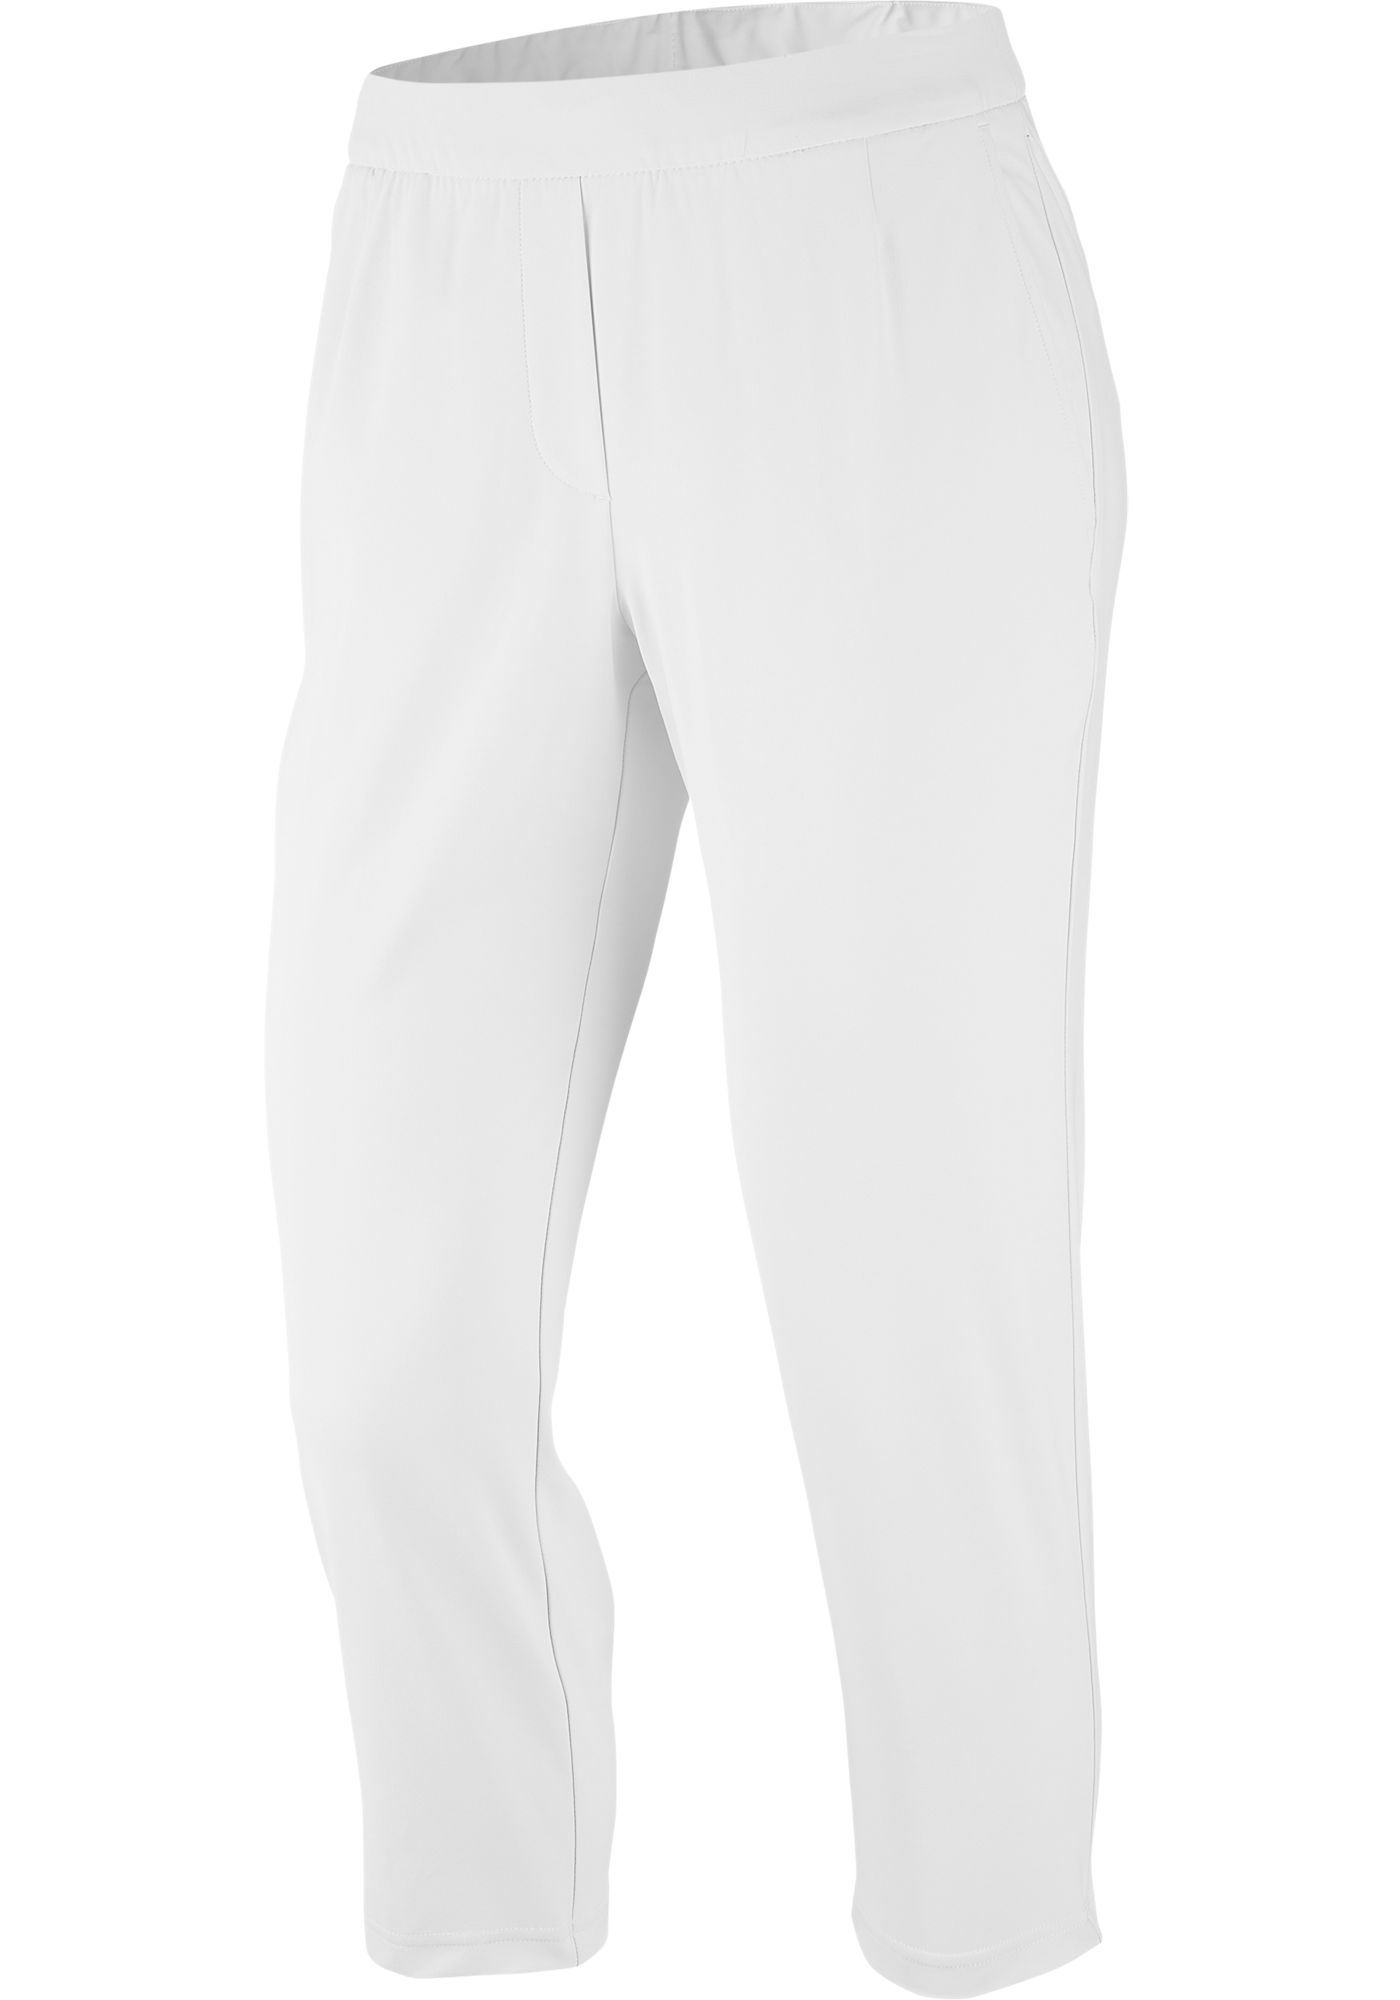 Nike Women's Flex UV Victory ¾ Golf Pants